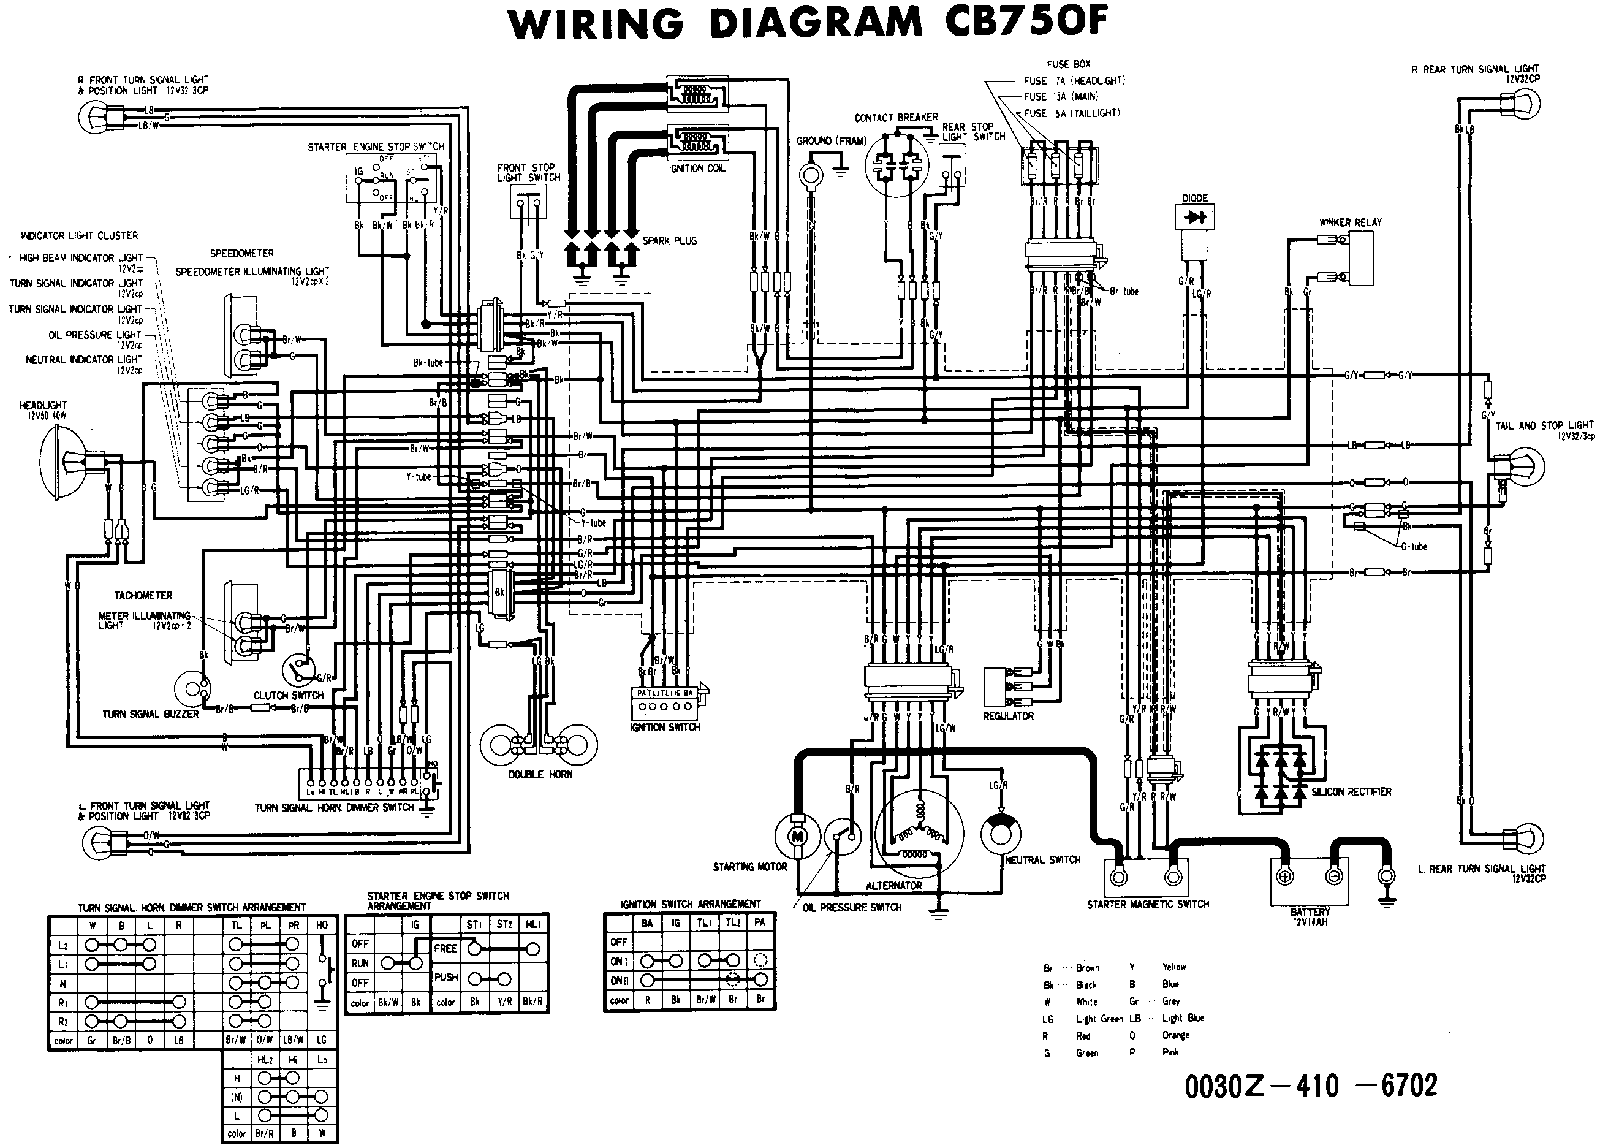 Click image for larger version.  Name:cb750_print_daniel_peirce.jpg Views:111 Size:116.5 KB ID:1450